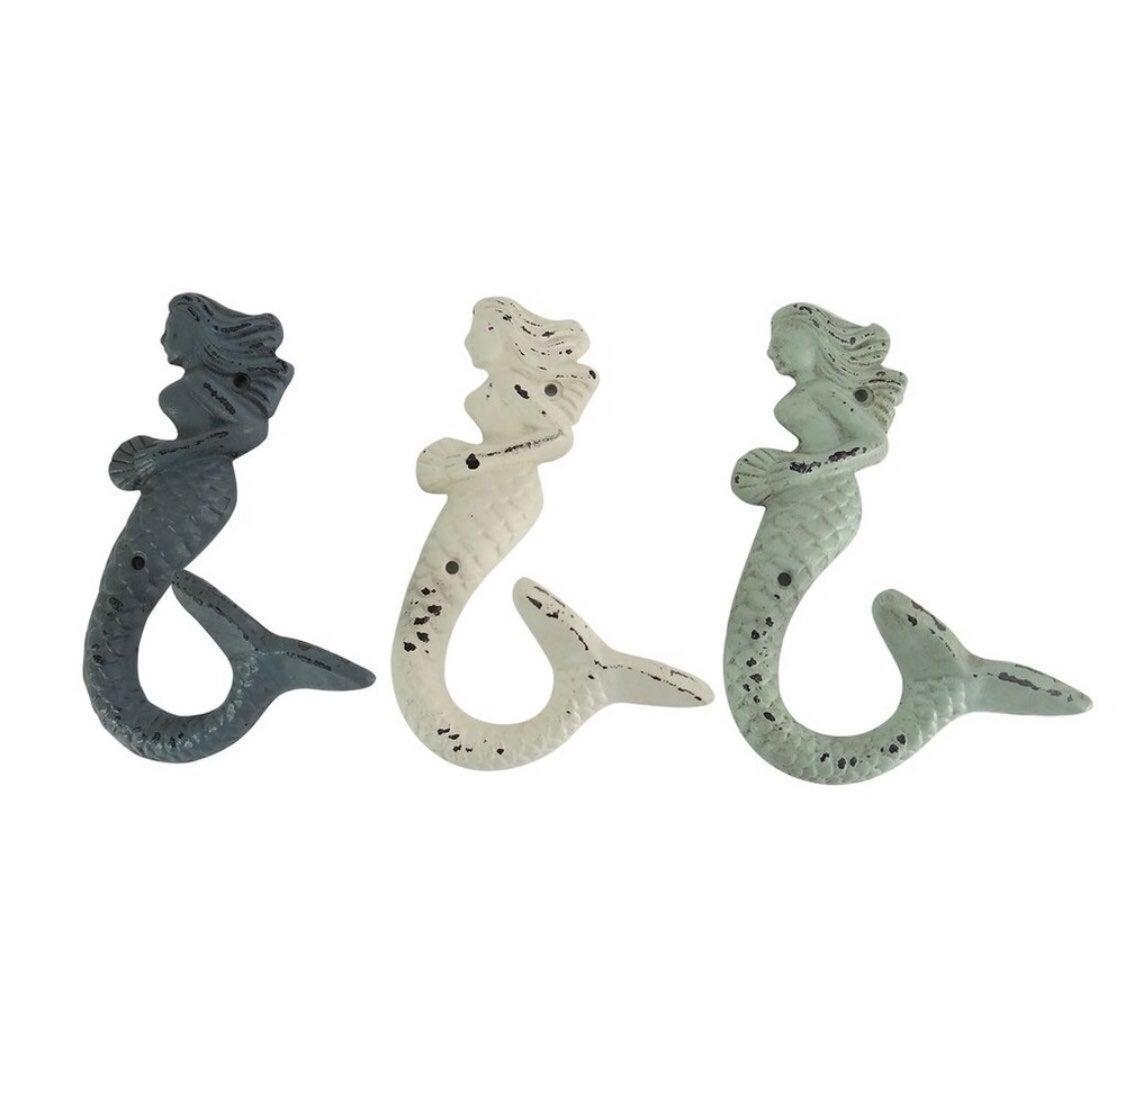 Mermaid Cast Iron Hooks- New In Box